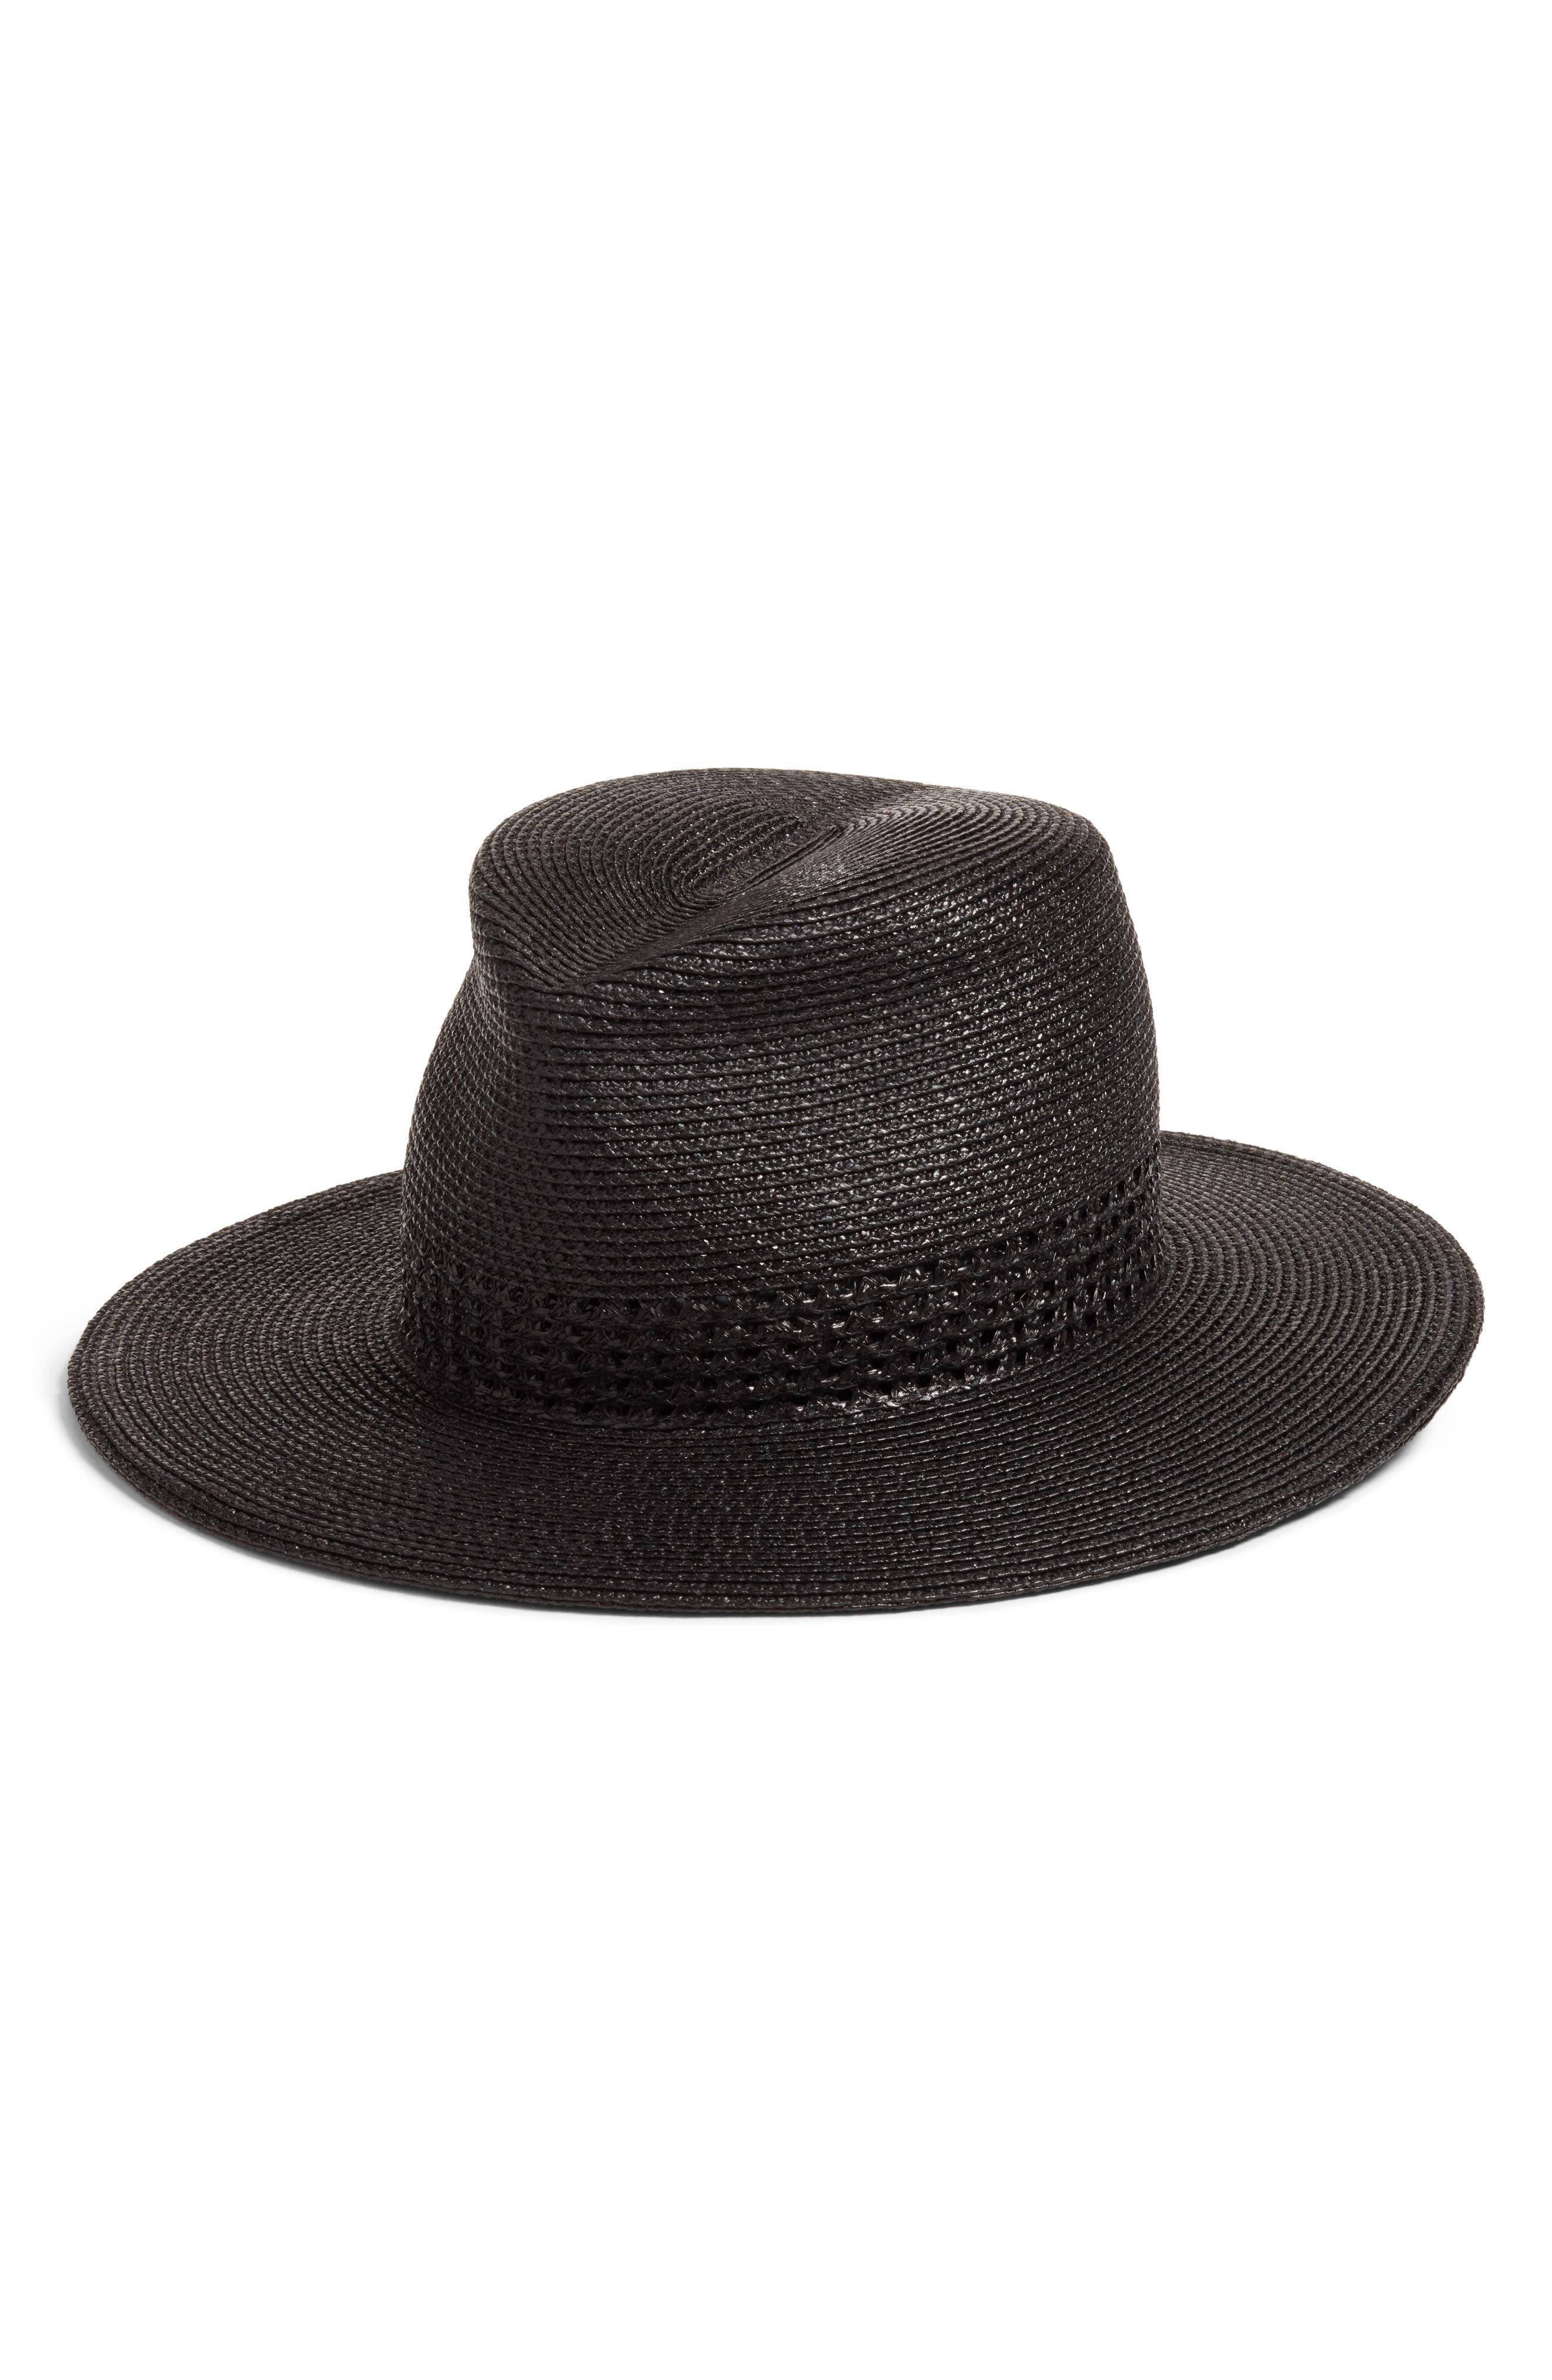 Bayou Packable Squishee<sup>®</sup> Fedora,                             Main thumbnail 1, color,                             Black